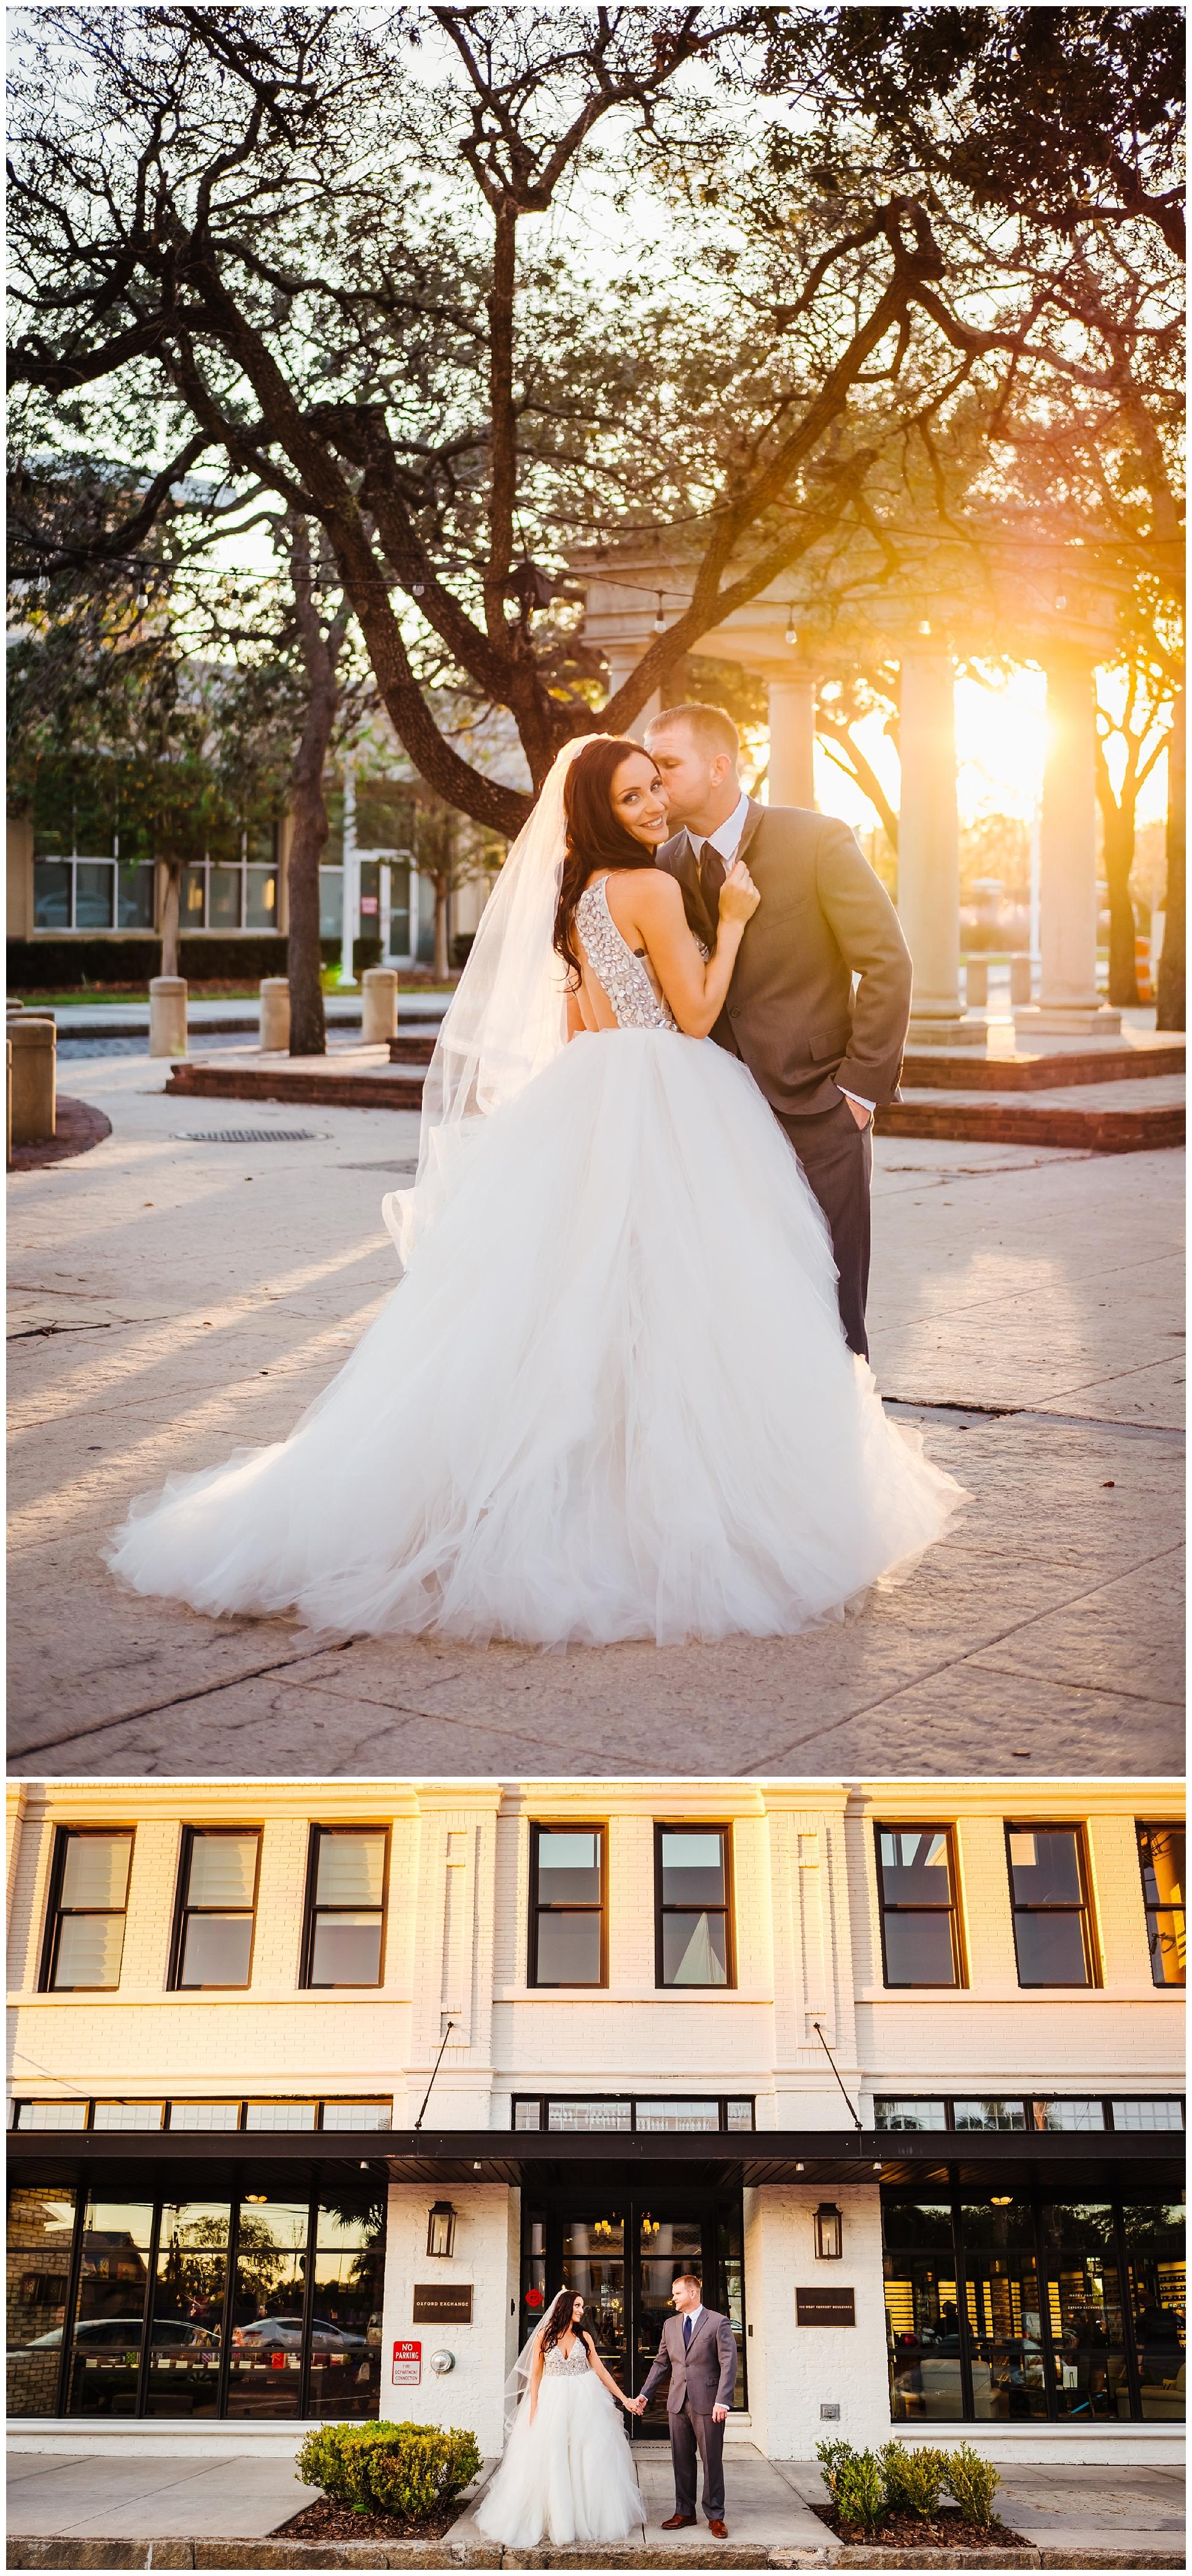 tampa-wedding-photographer-oxford-exchange-garland-candlelight-gold-hayley-paige_0033.jpg